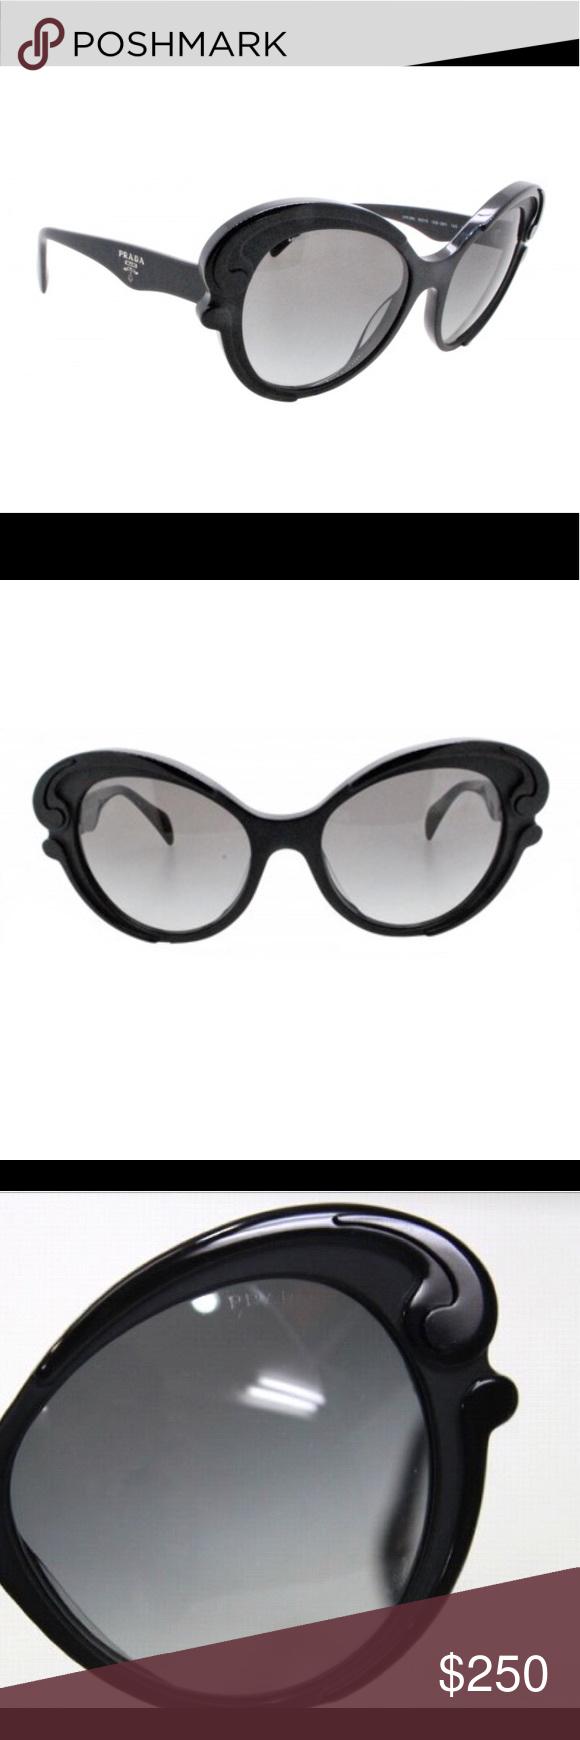 3b832701f1f AUTHENTIC. -Prada Black Signature Plastic Cat Eye Matte Glossy Spr 28n 56  19 Sunglasses. -6